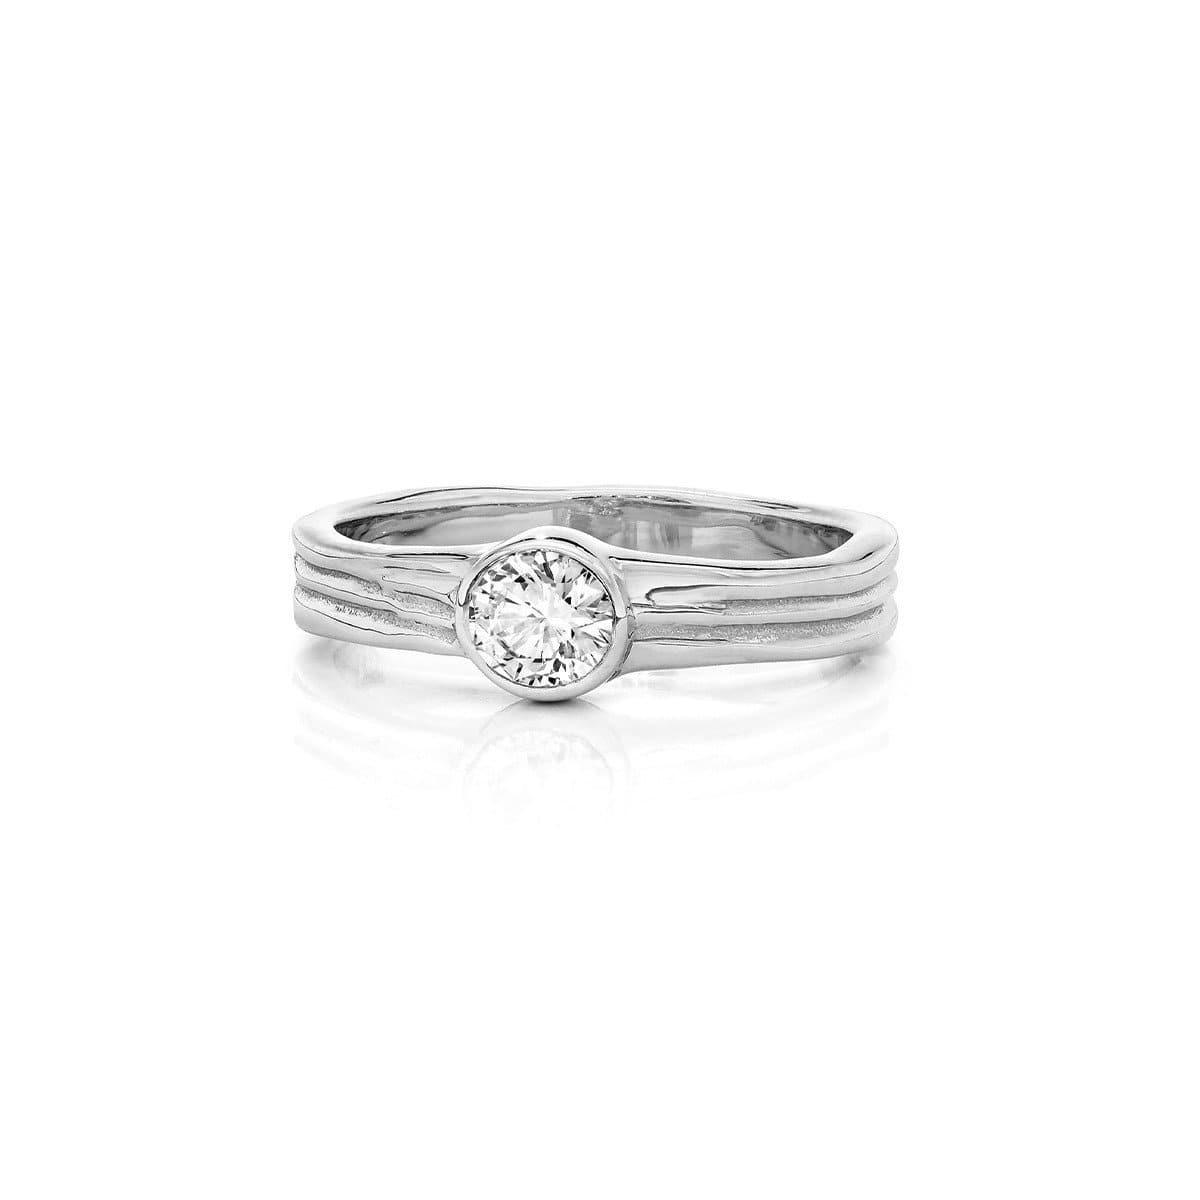 Waterfall Wedding/Engagement Ring White Gold